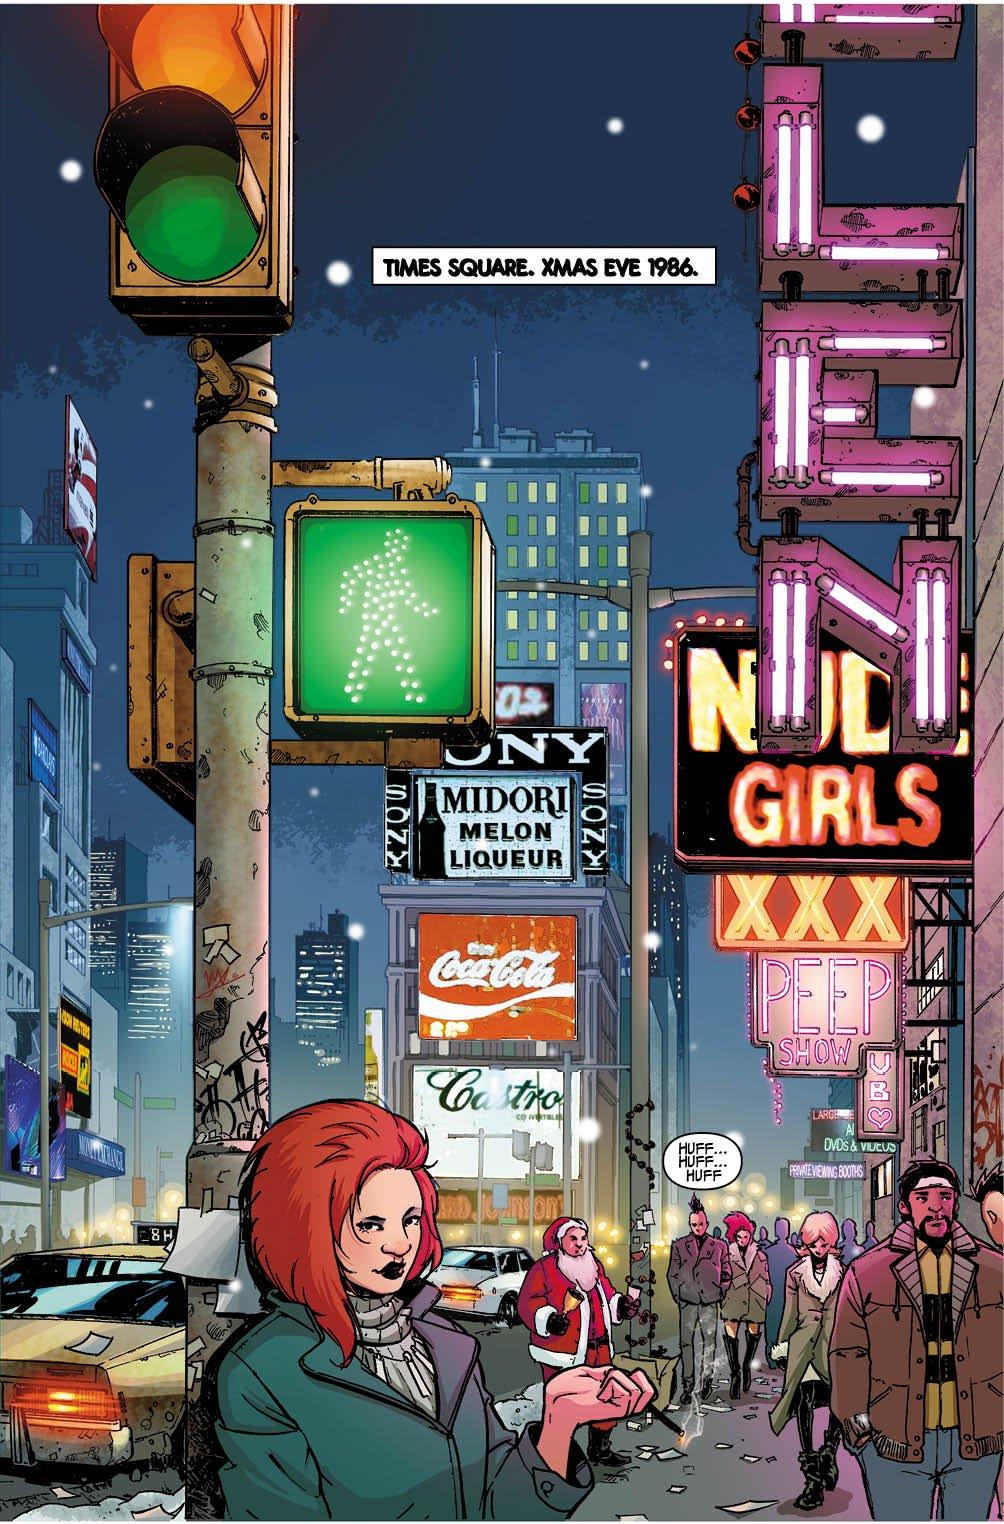 Peepland #1 (Comic) Review 4